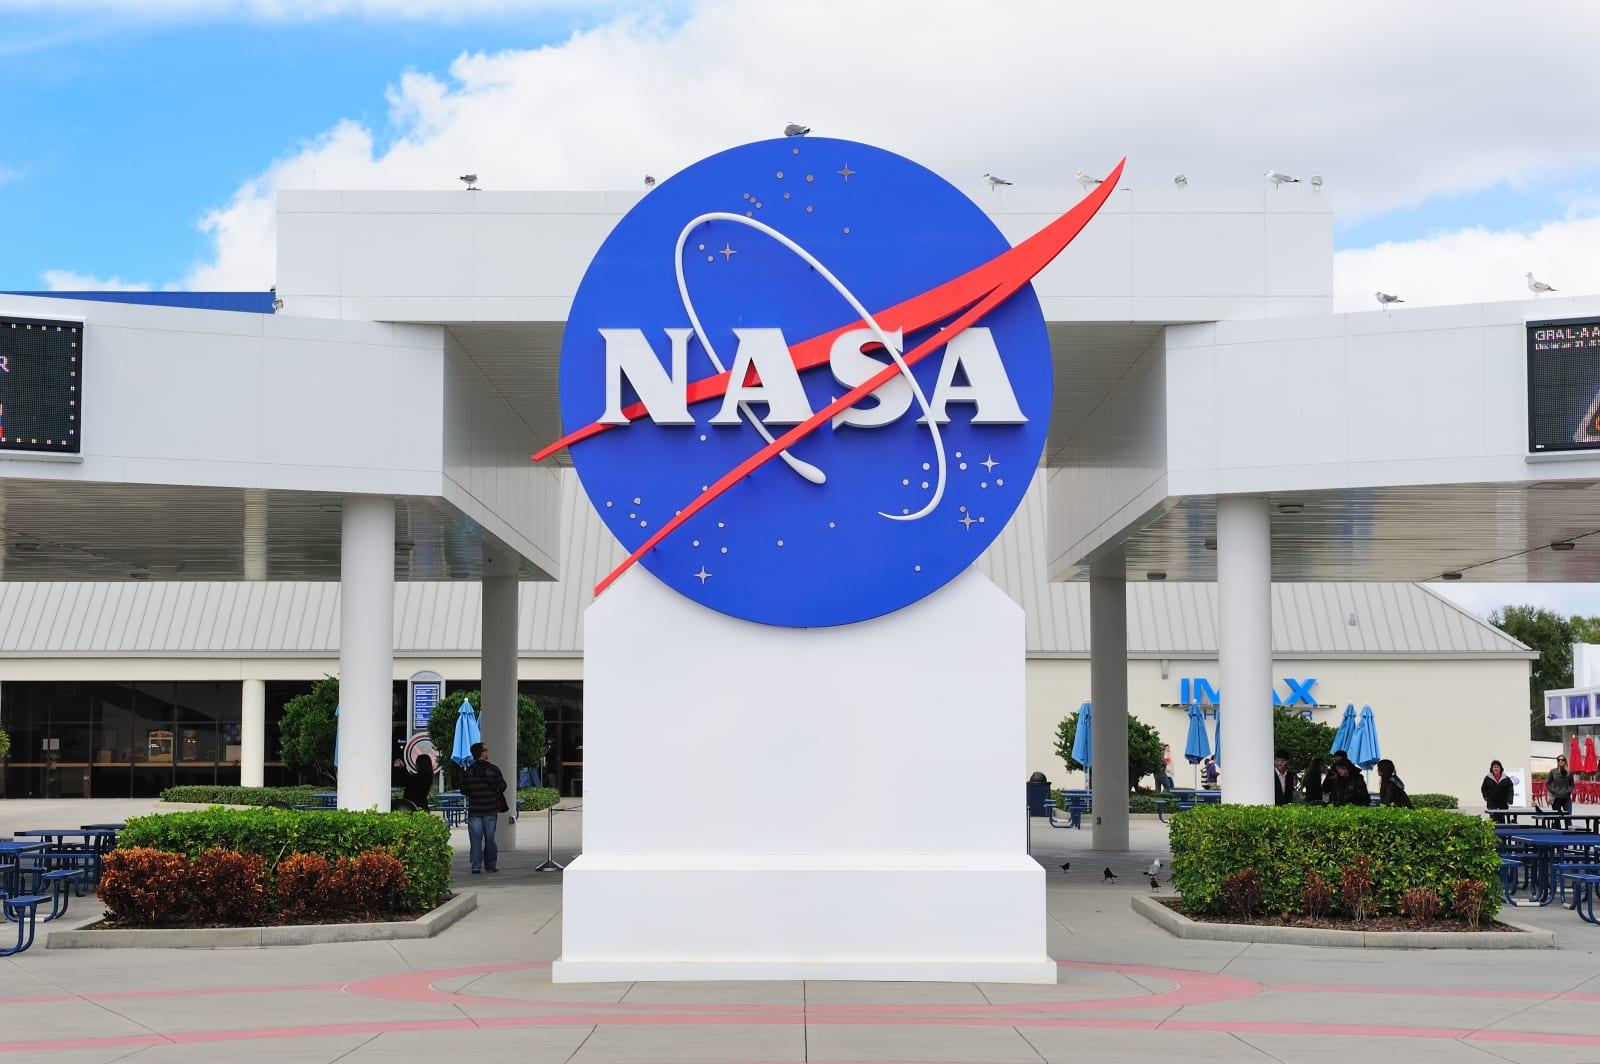 MERRITT ISLAND, FL - FEB 12: NASA logo in Kennedy Space Center on February 12, 2012 in Merritt Island, Florida. It is the launch